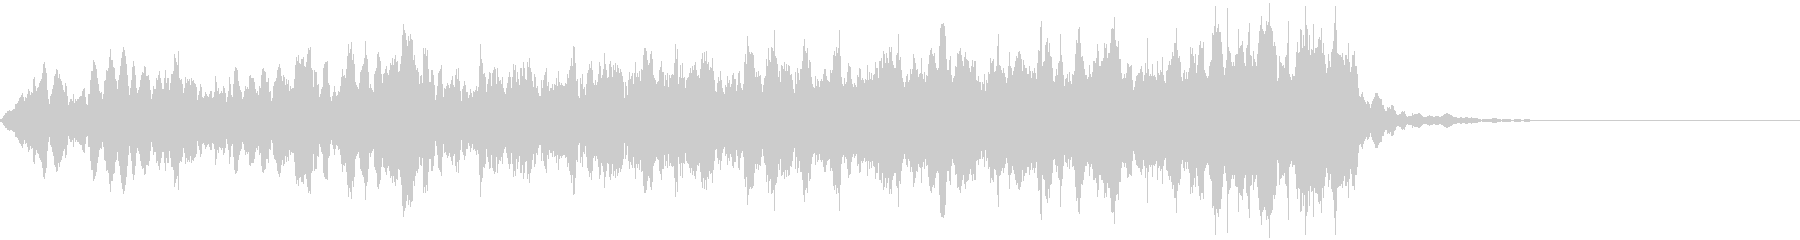 CINEMATIC RISER_18の未再生の波形